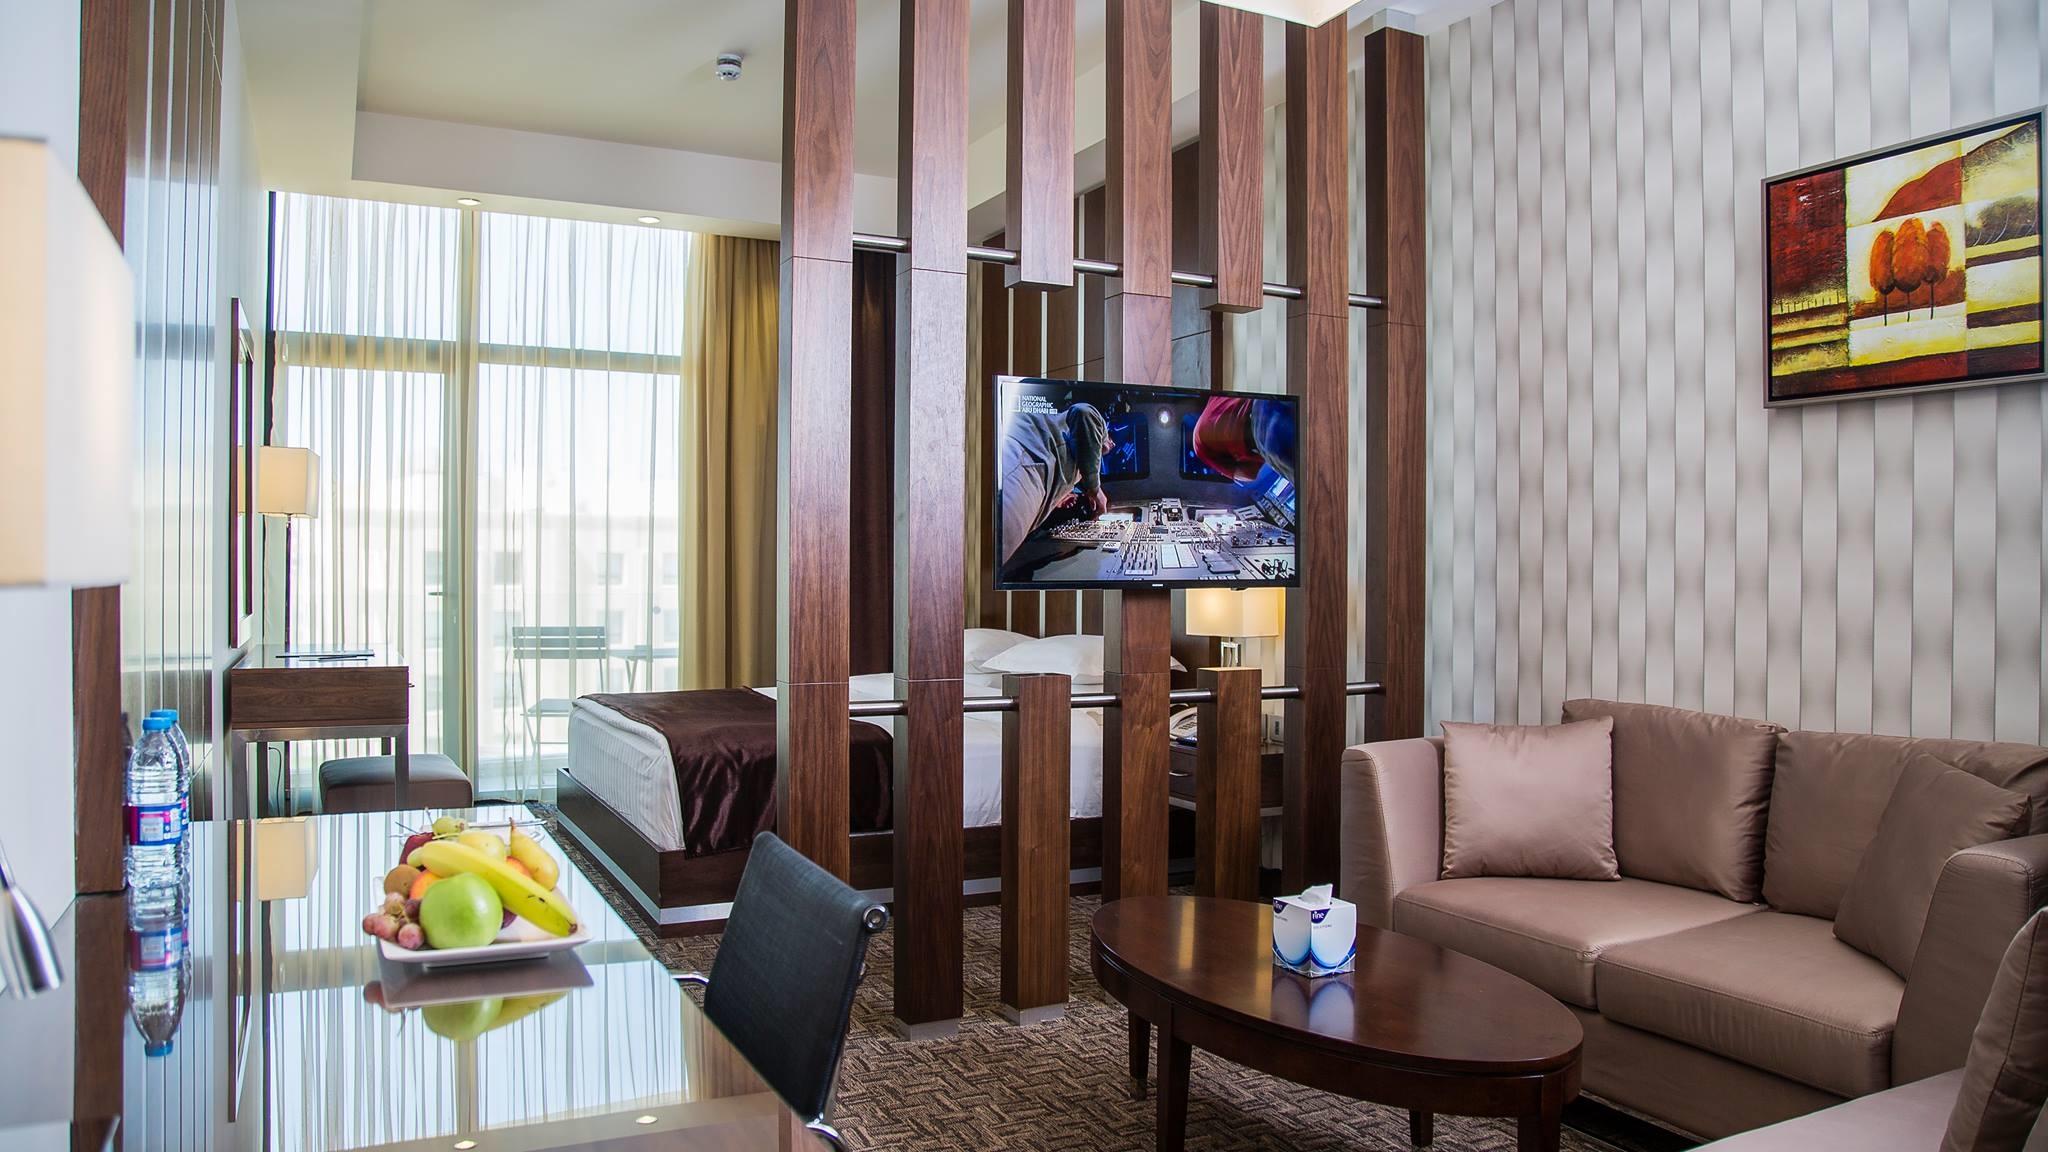 Best Family Hotels in Jordan Sulaf Hotel